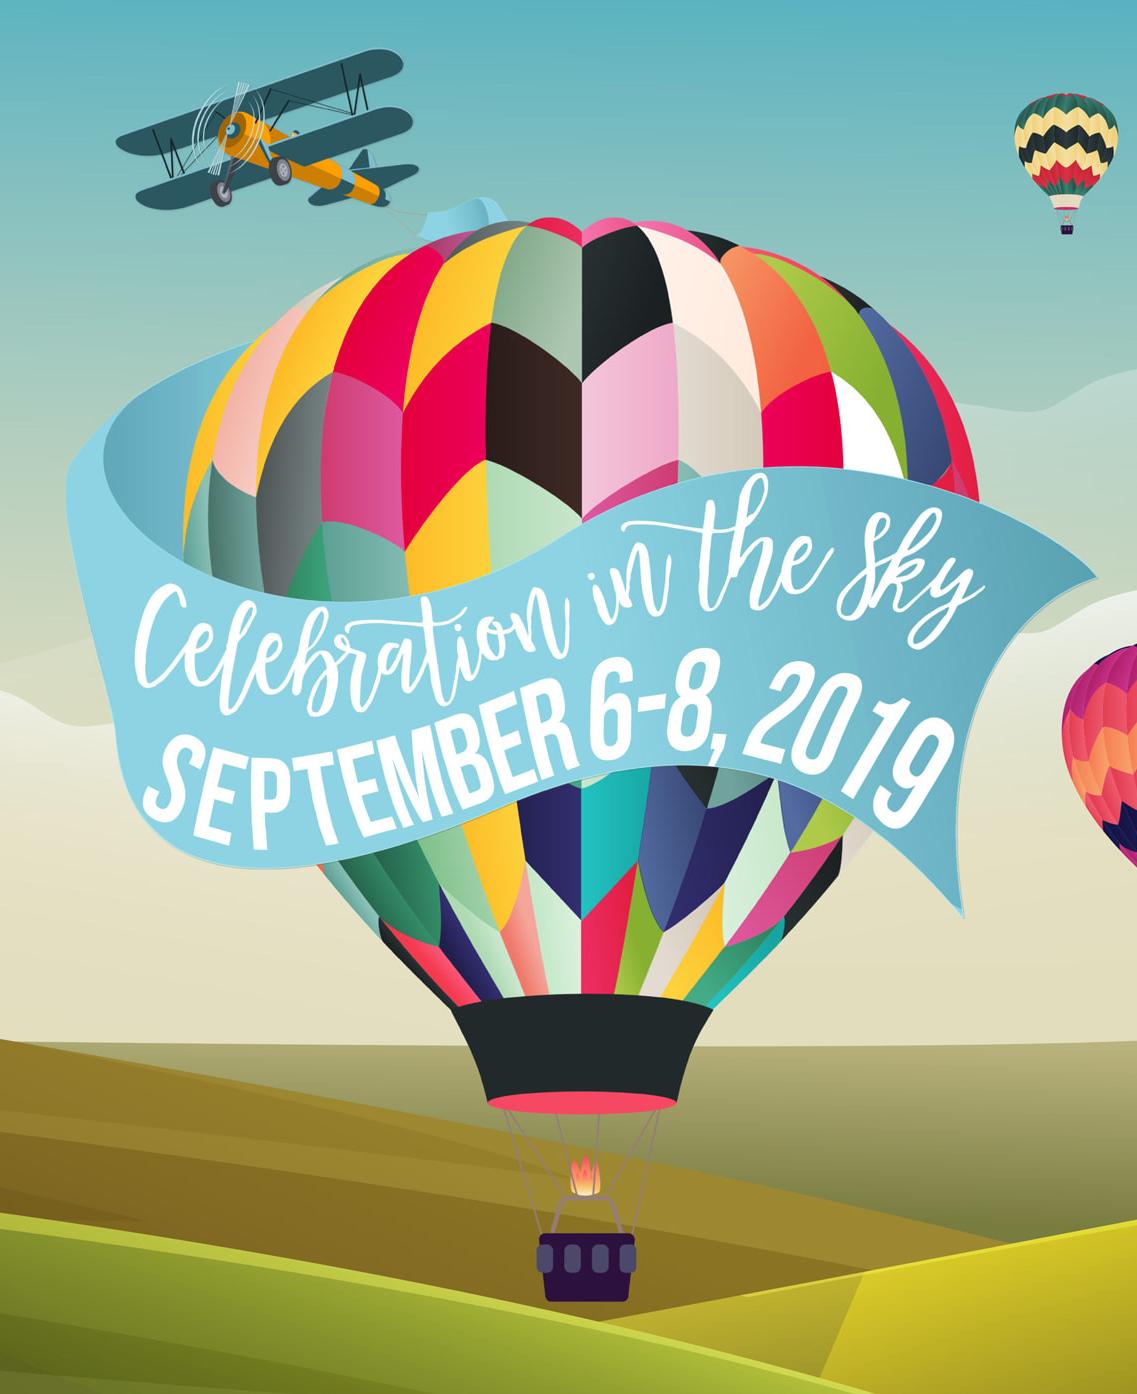 Harrison Balloon Festival 2019